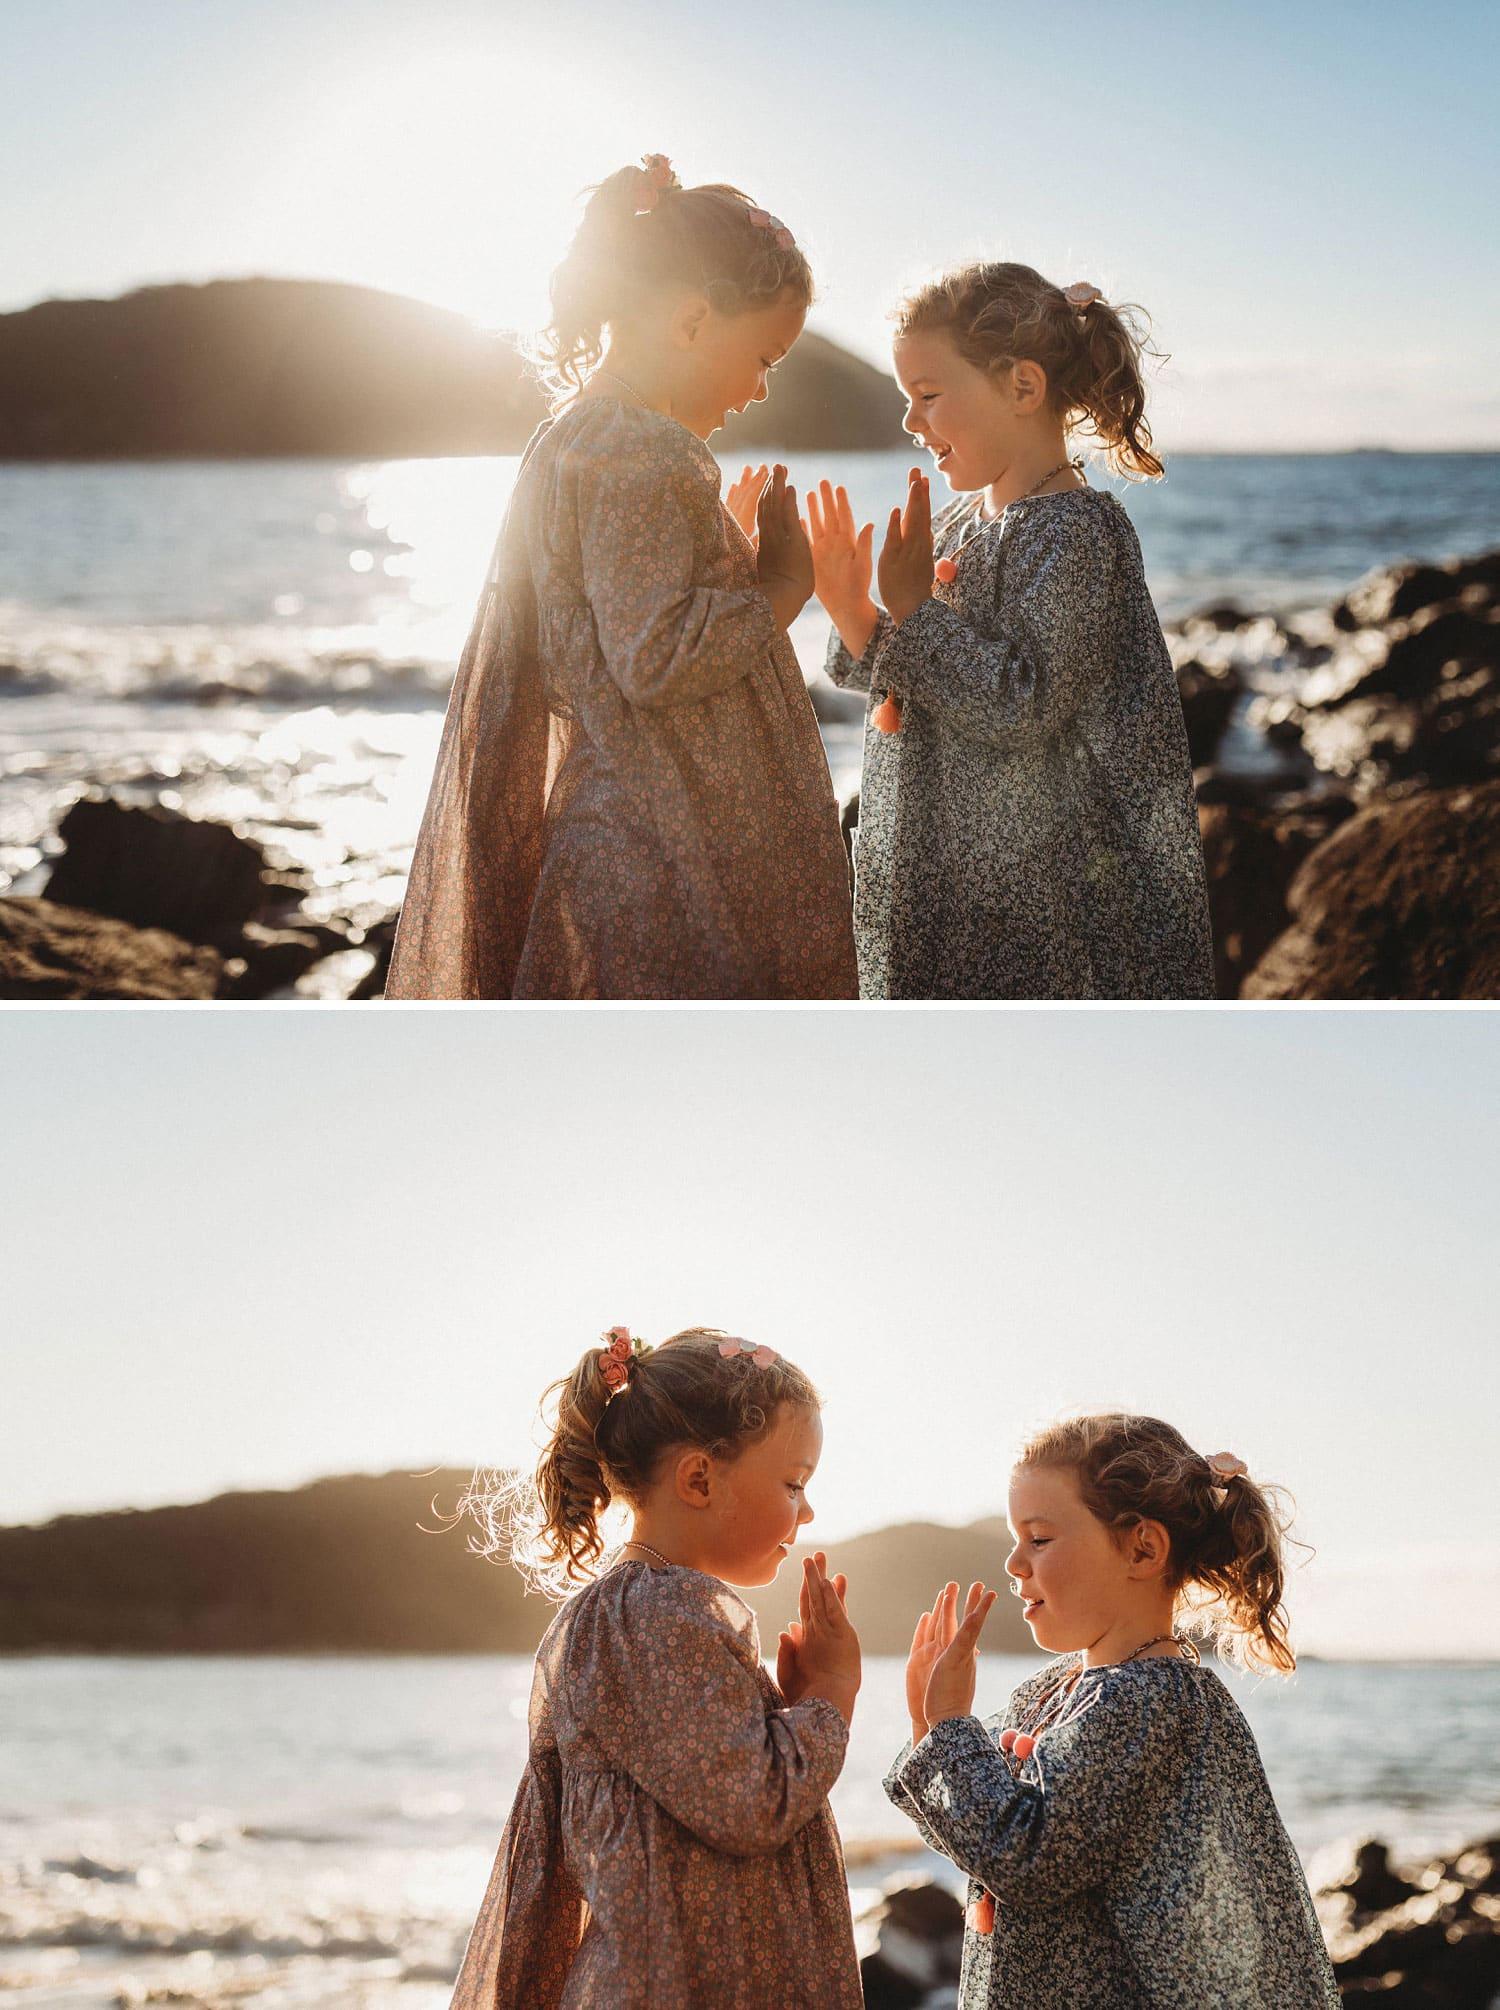 Siblings-natural-photos-sydney